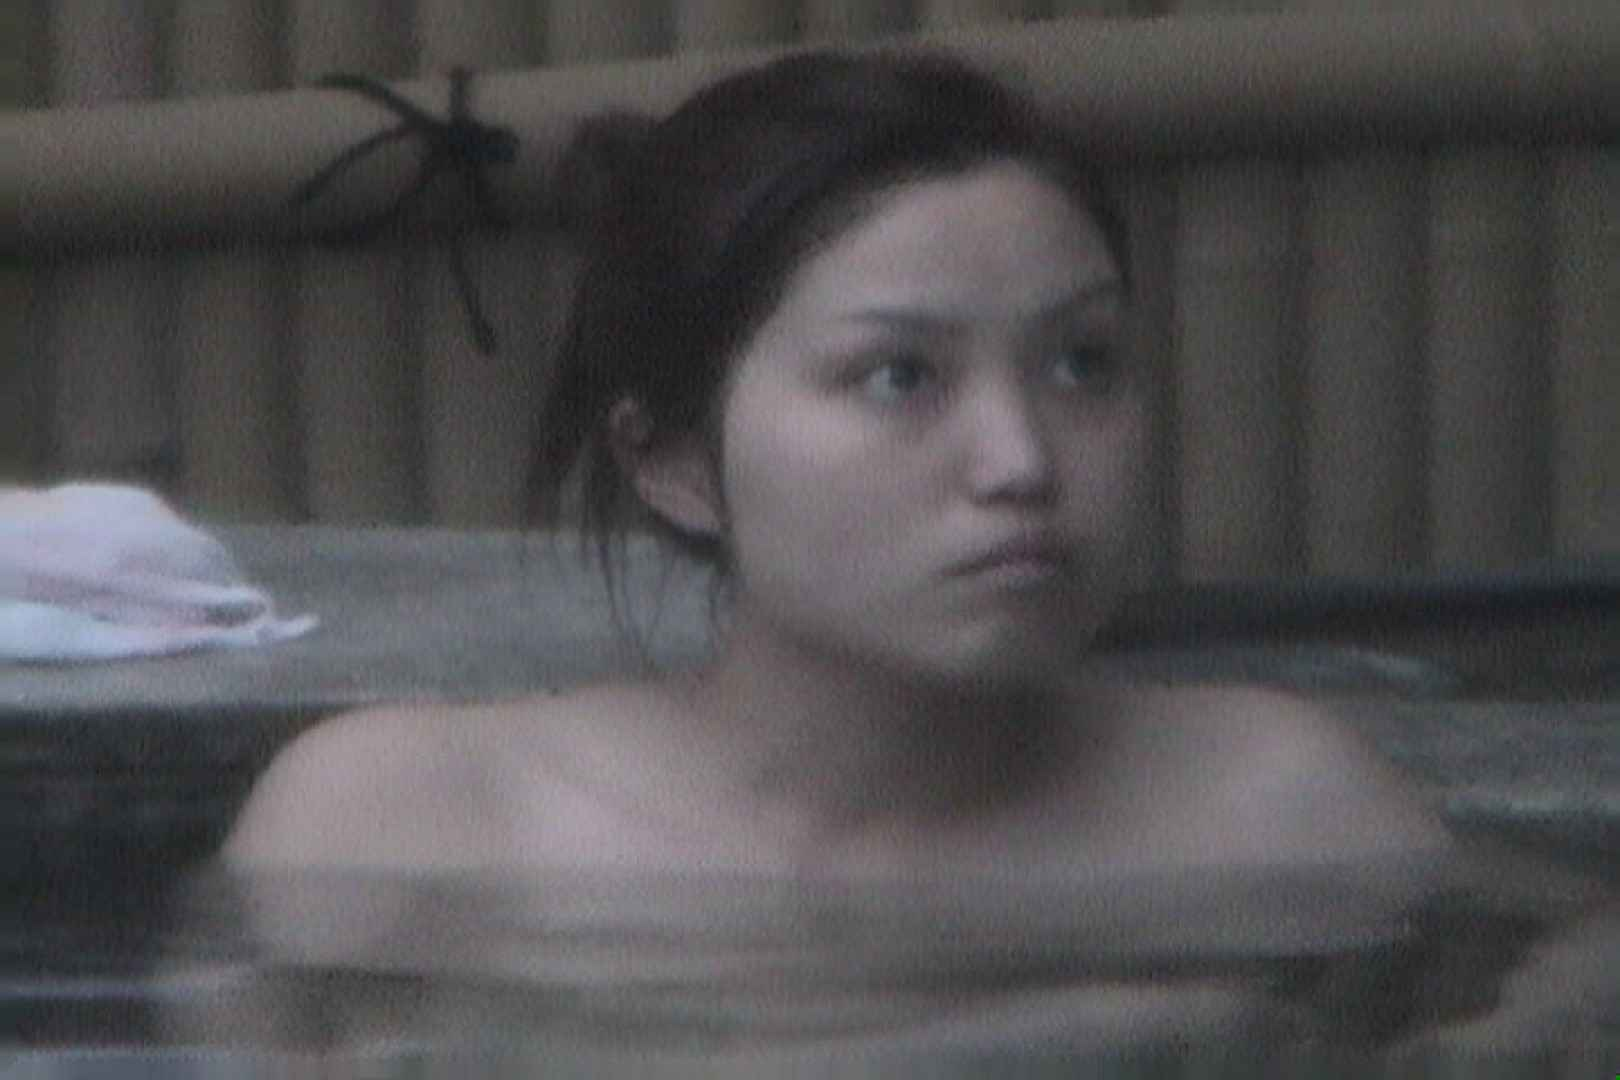 Aquaな露天風呂Vol.602 露天風呂突入 性交動画流出 98pic 29